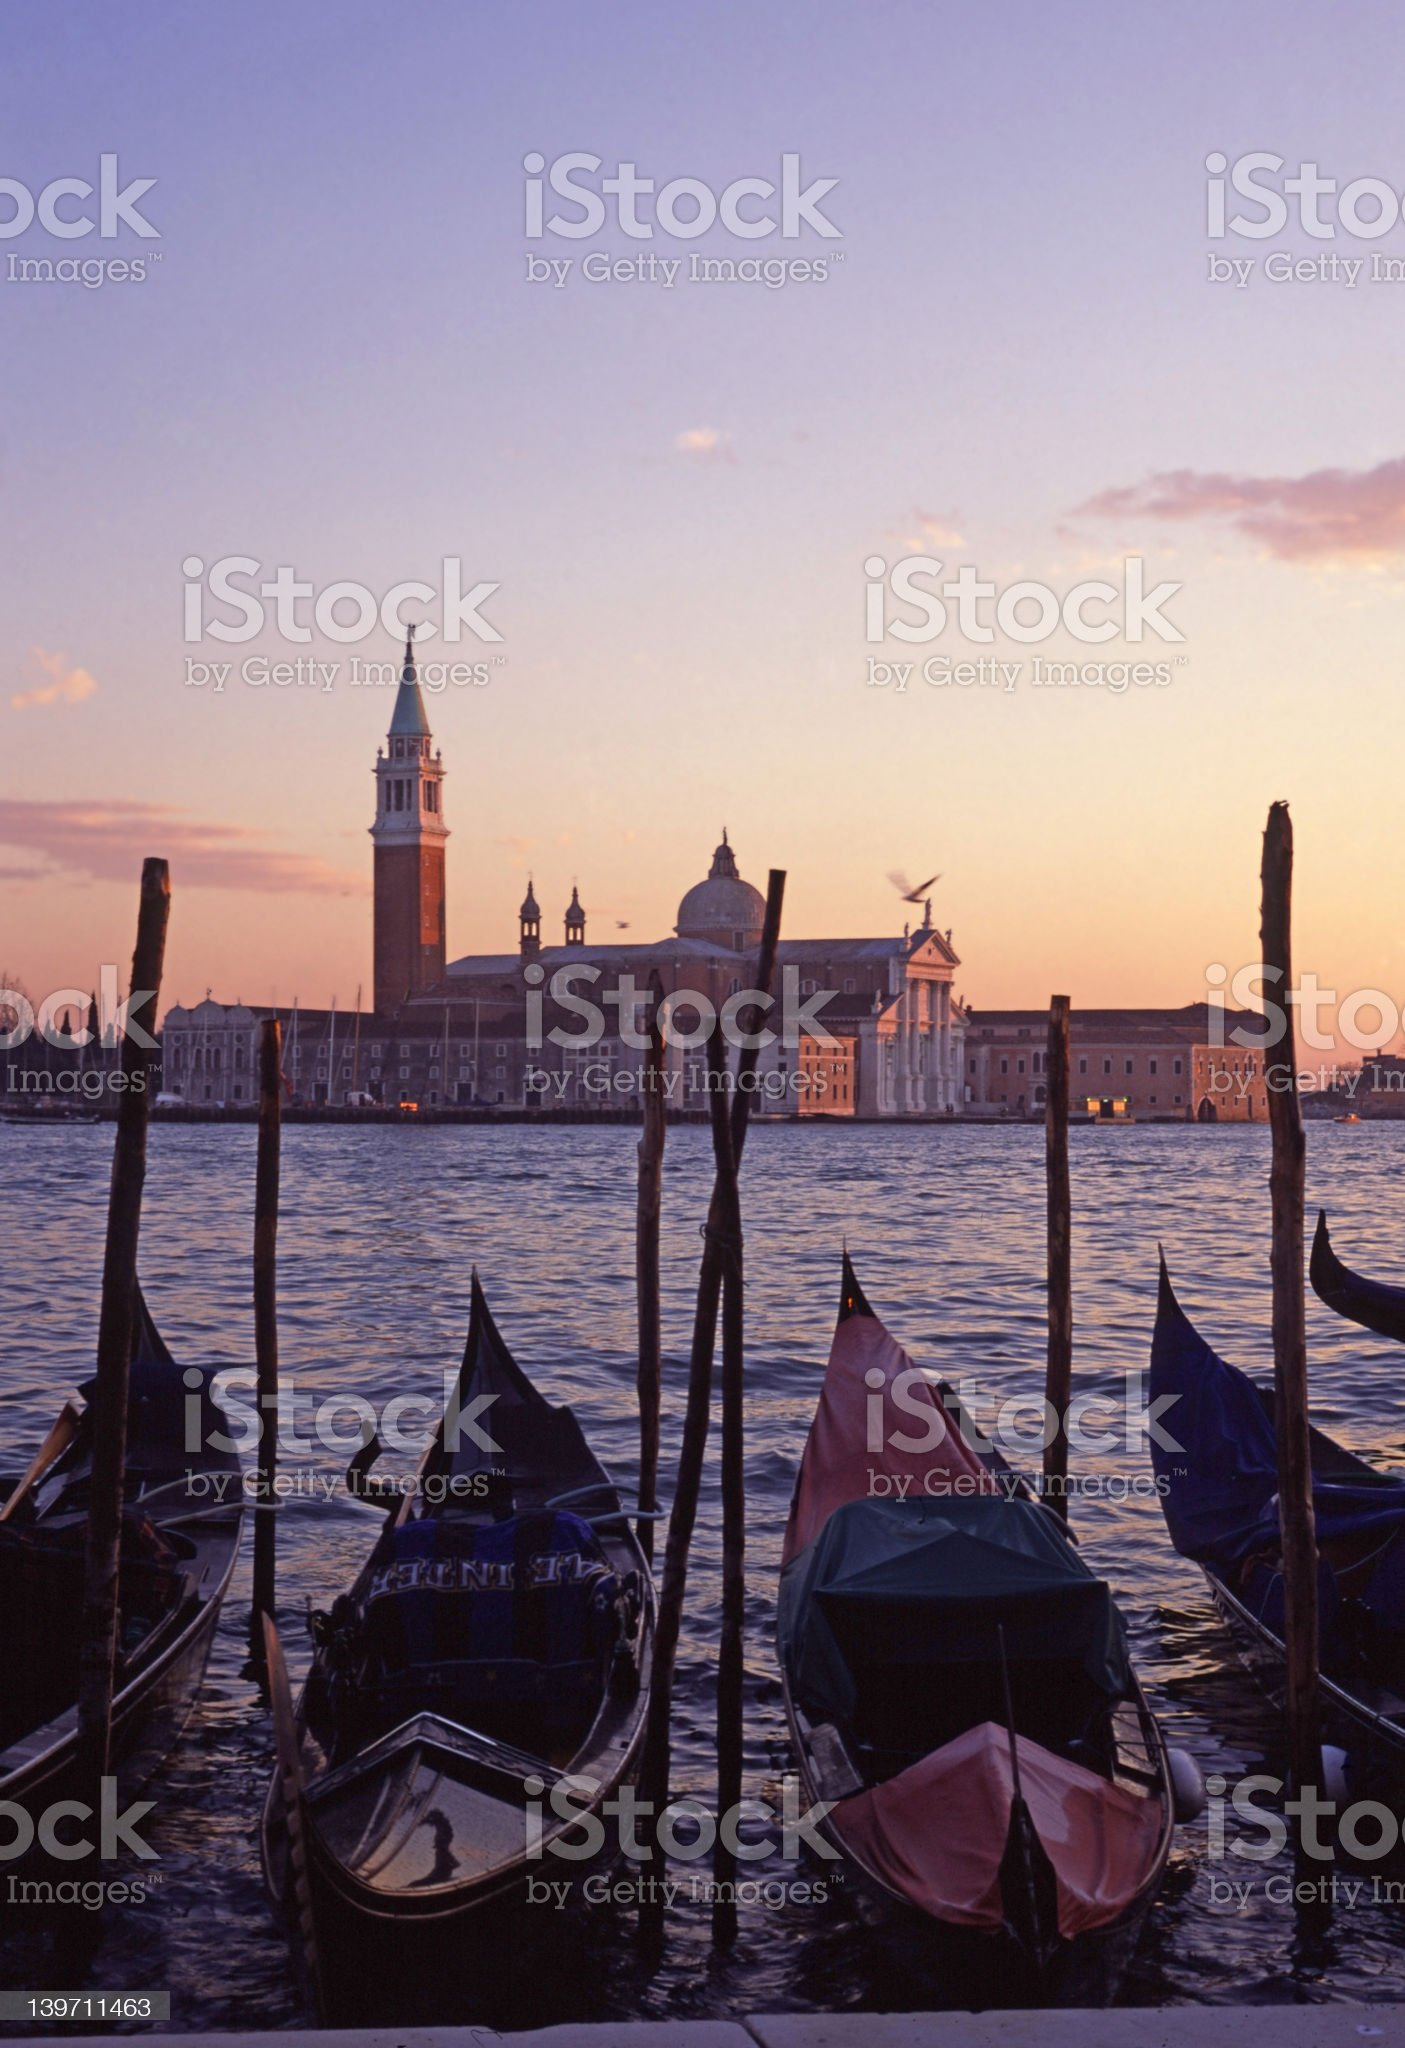 Gondolas by Saint Georgio 4 royalty-free stock photo